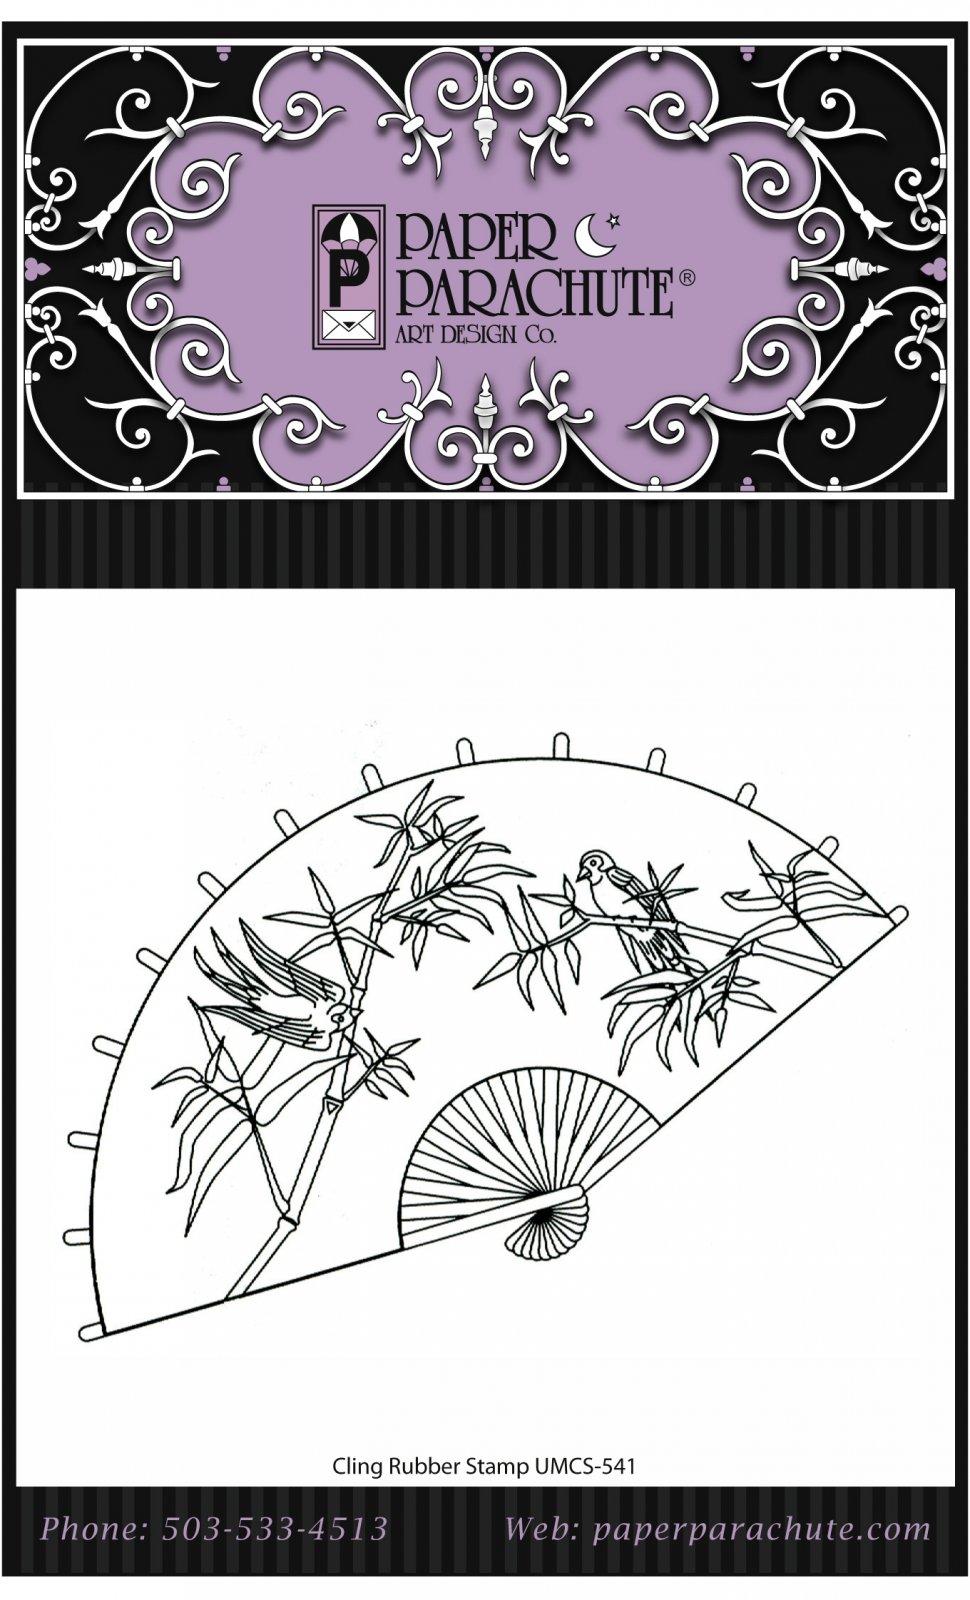 Paper Parachute Rubber Stamp - UMCS541